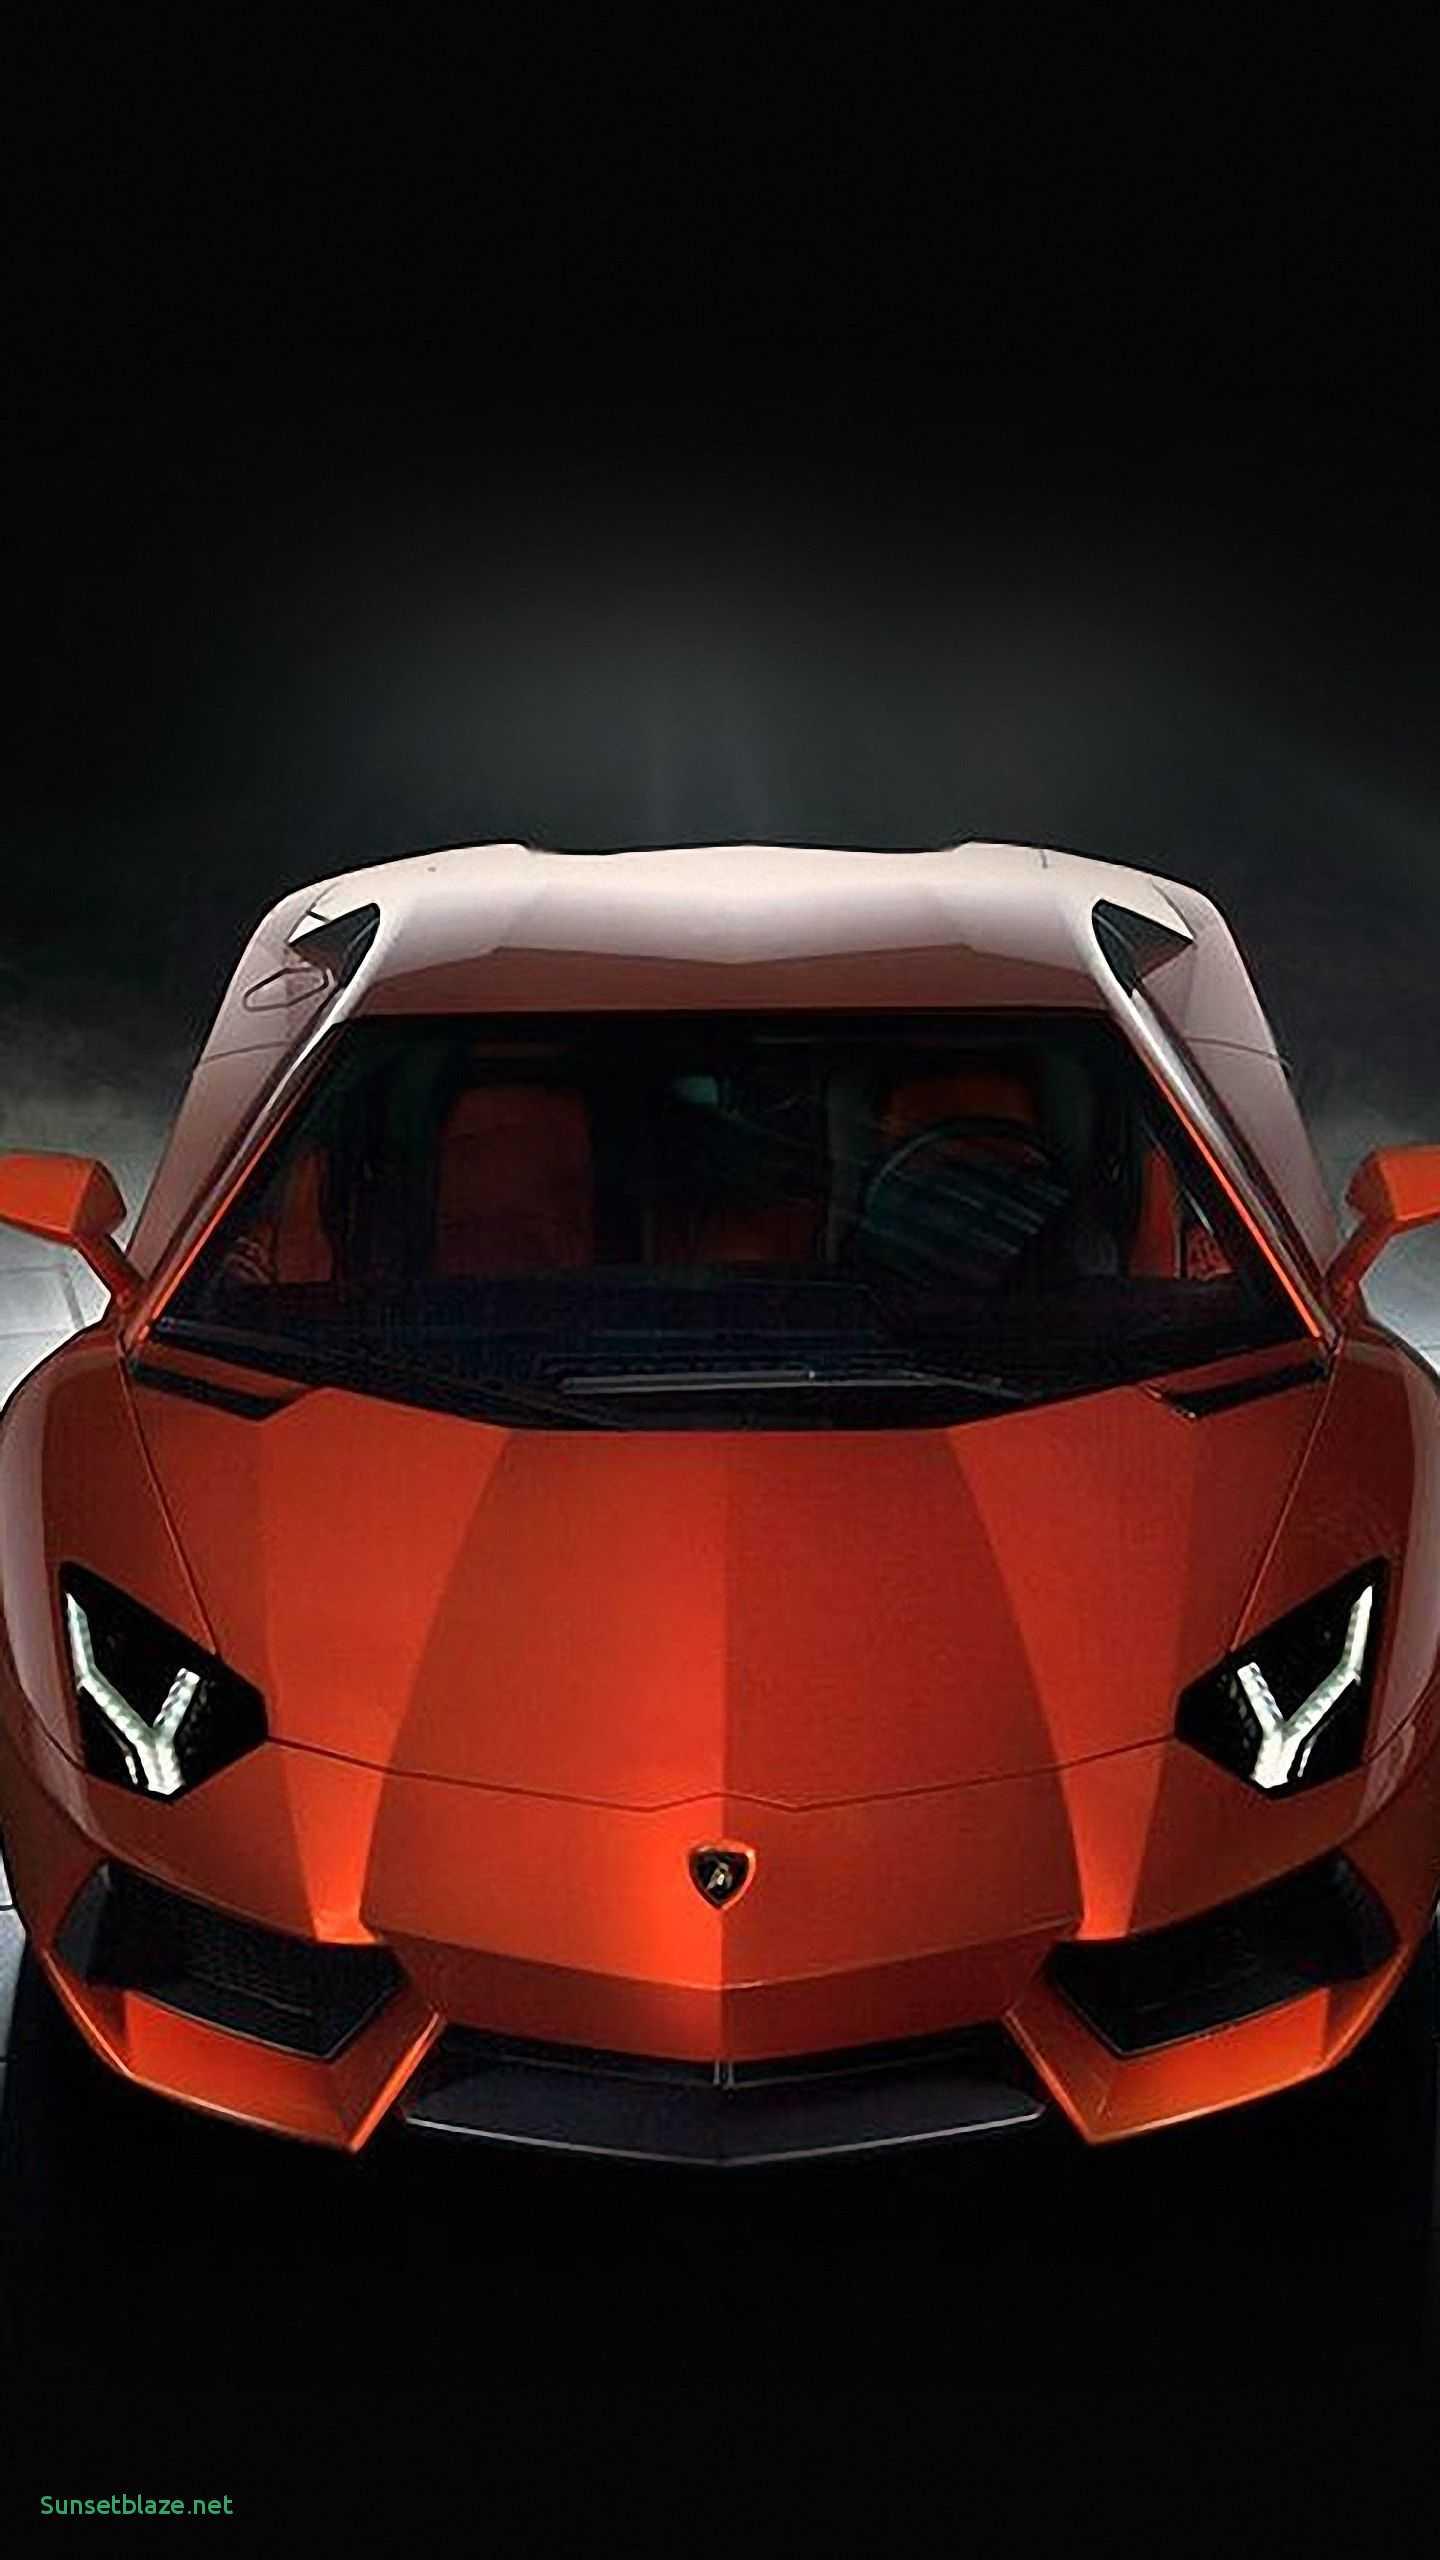 wallpaper hd for desktop full screen 1080p free download. Full Hd Car Wallpapers For Mobile Picture Idokeren